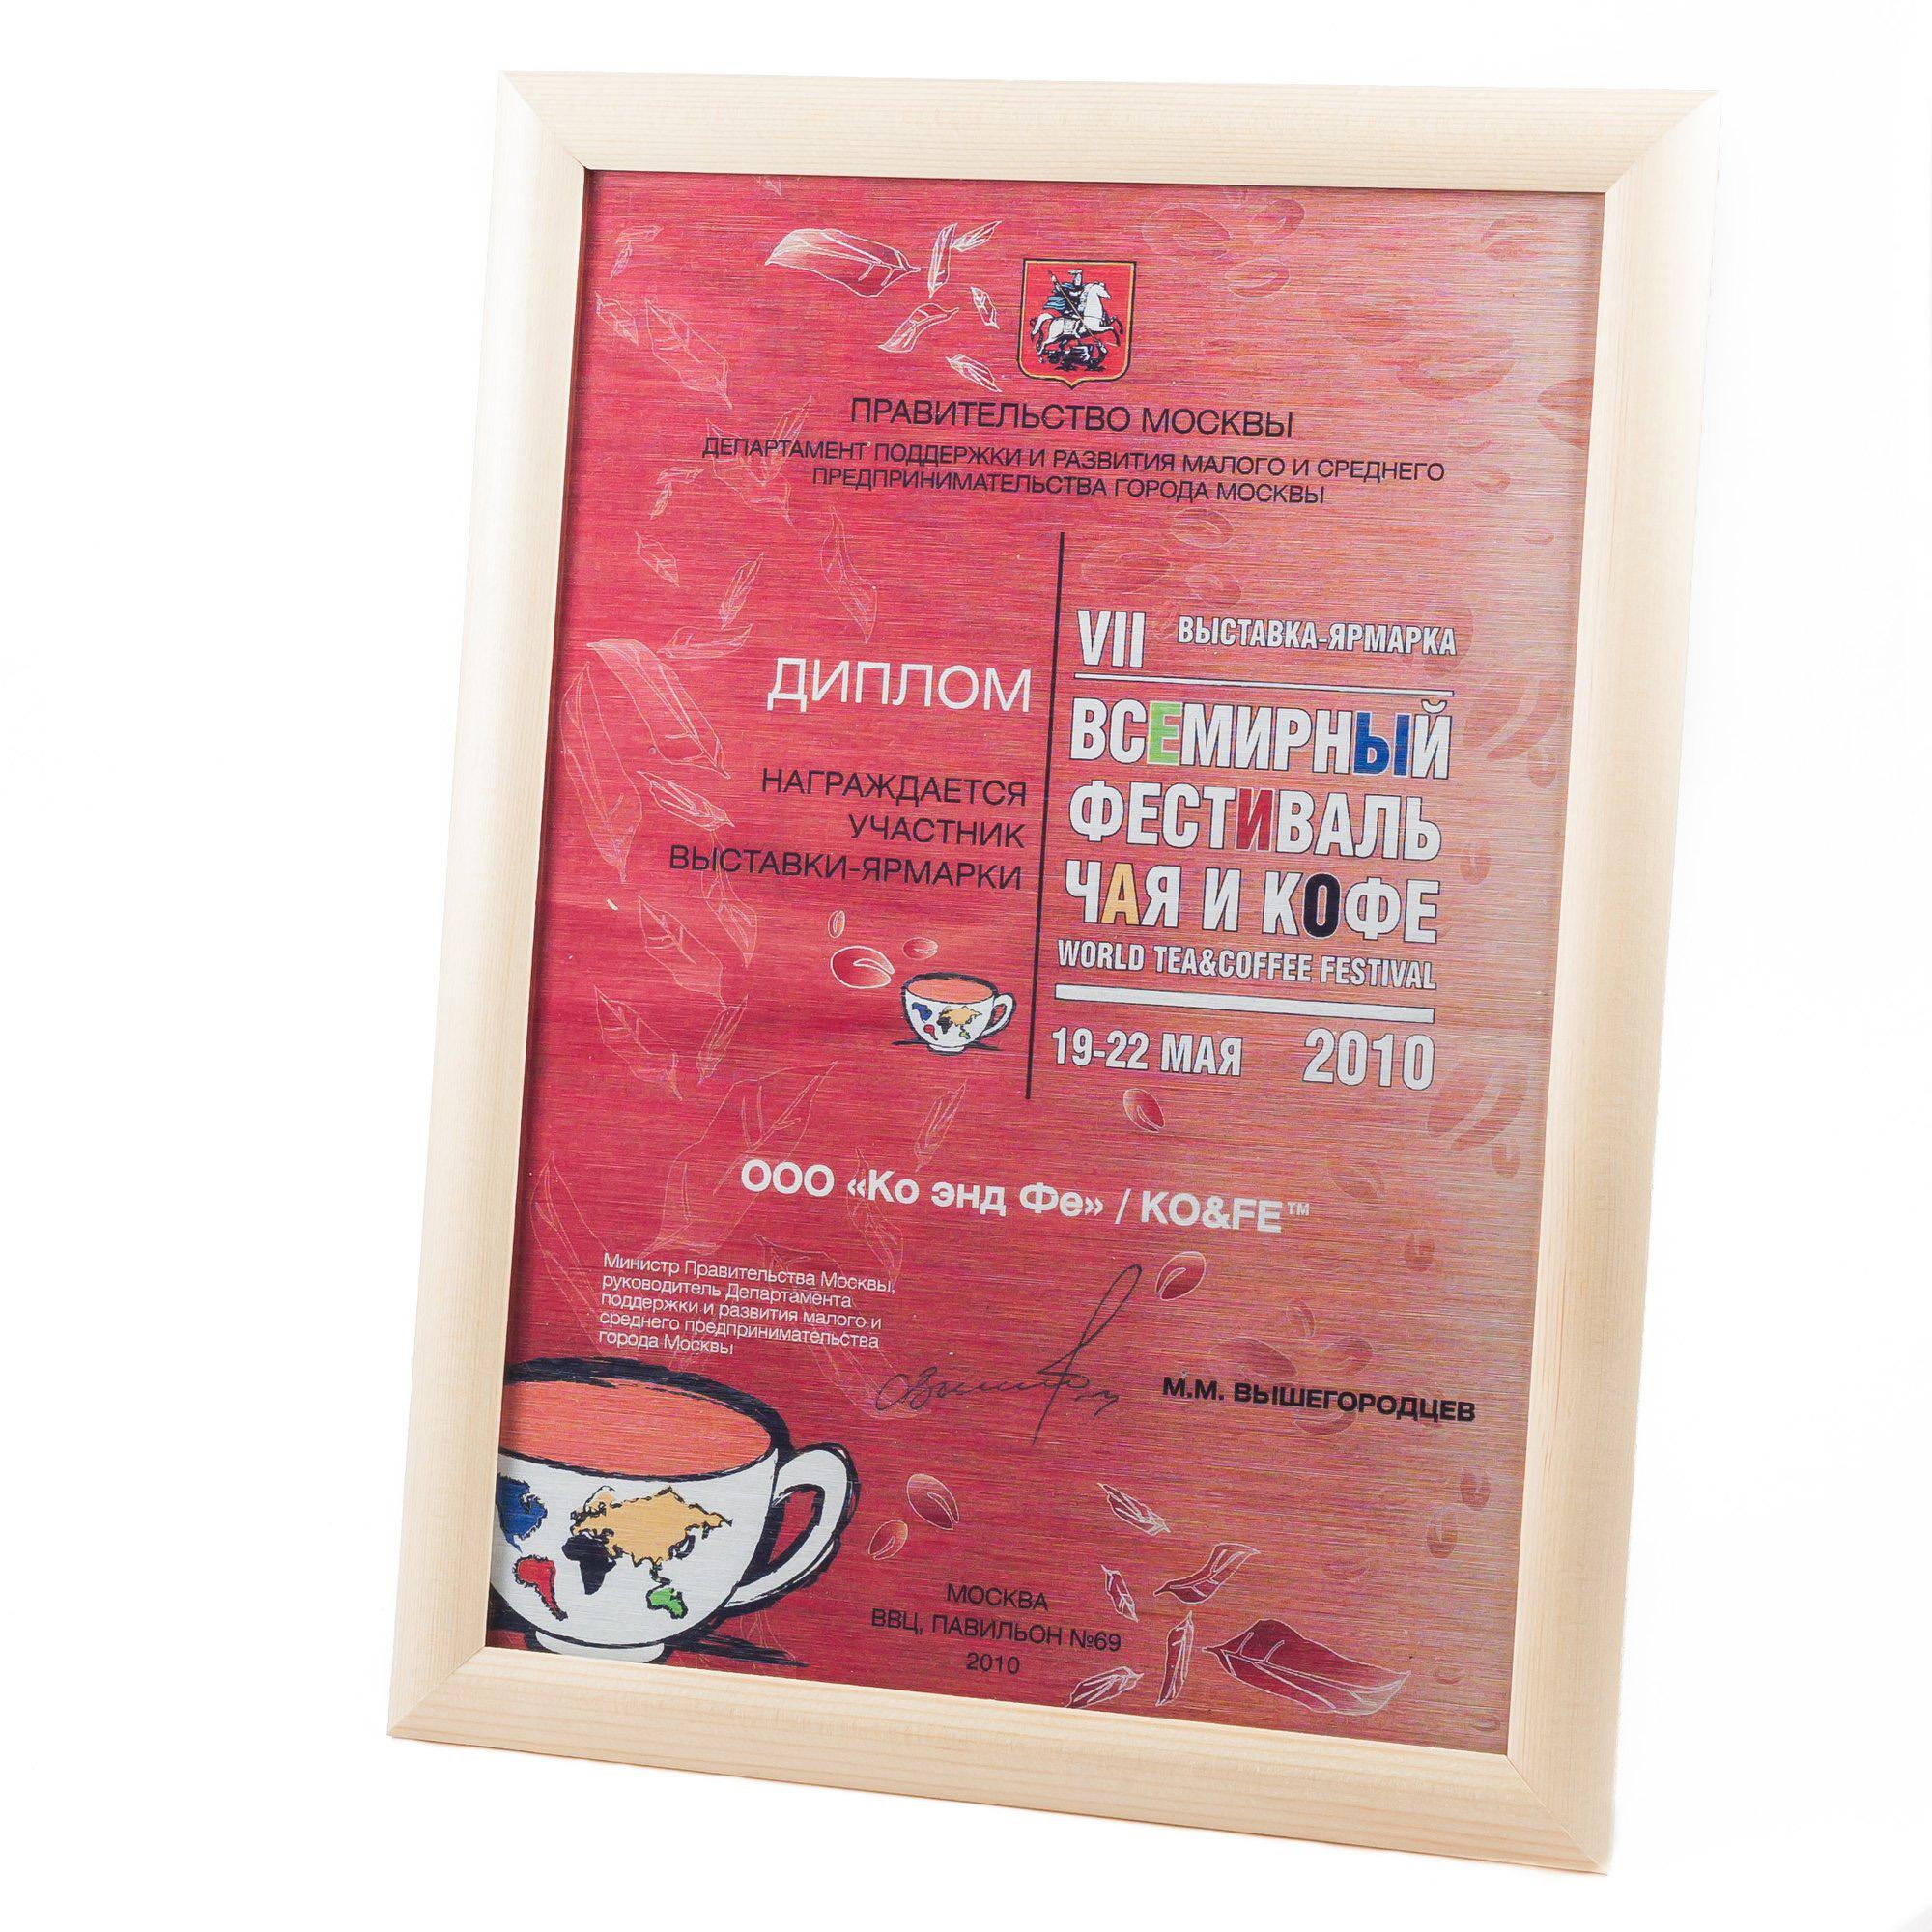 2010-vsemirnyi-festival-chaja-i-kofe-diplom.jpg